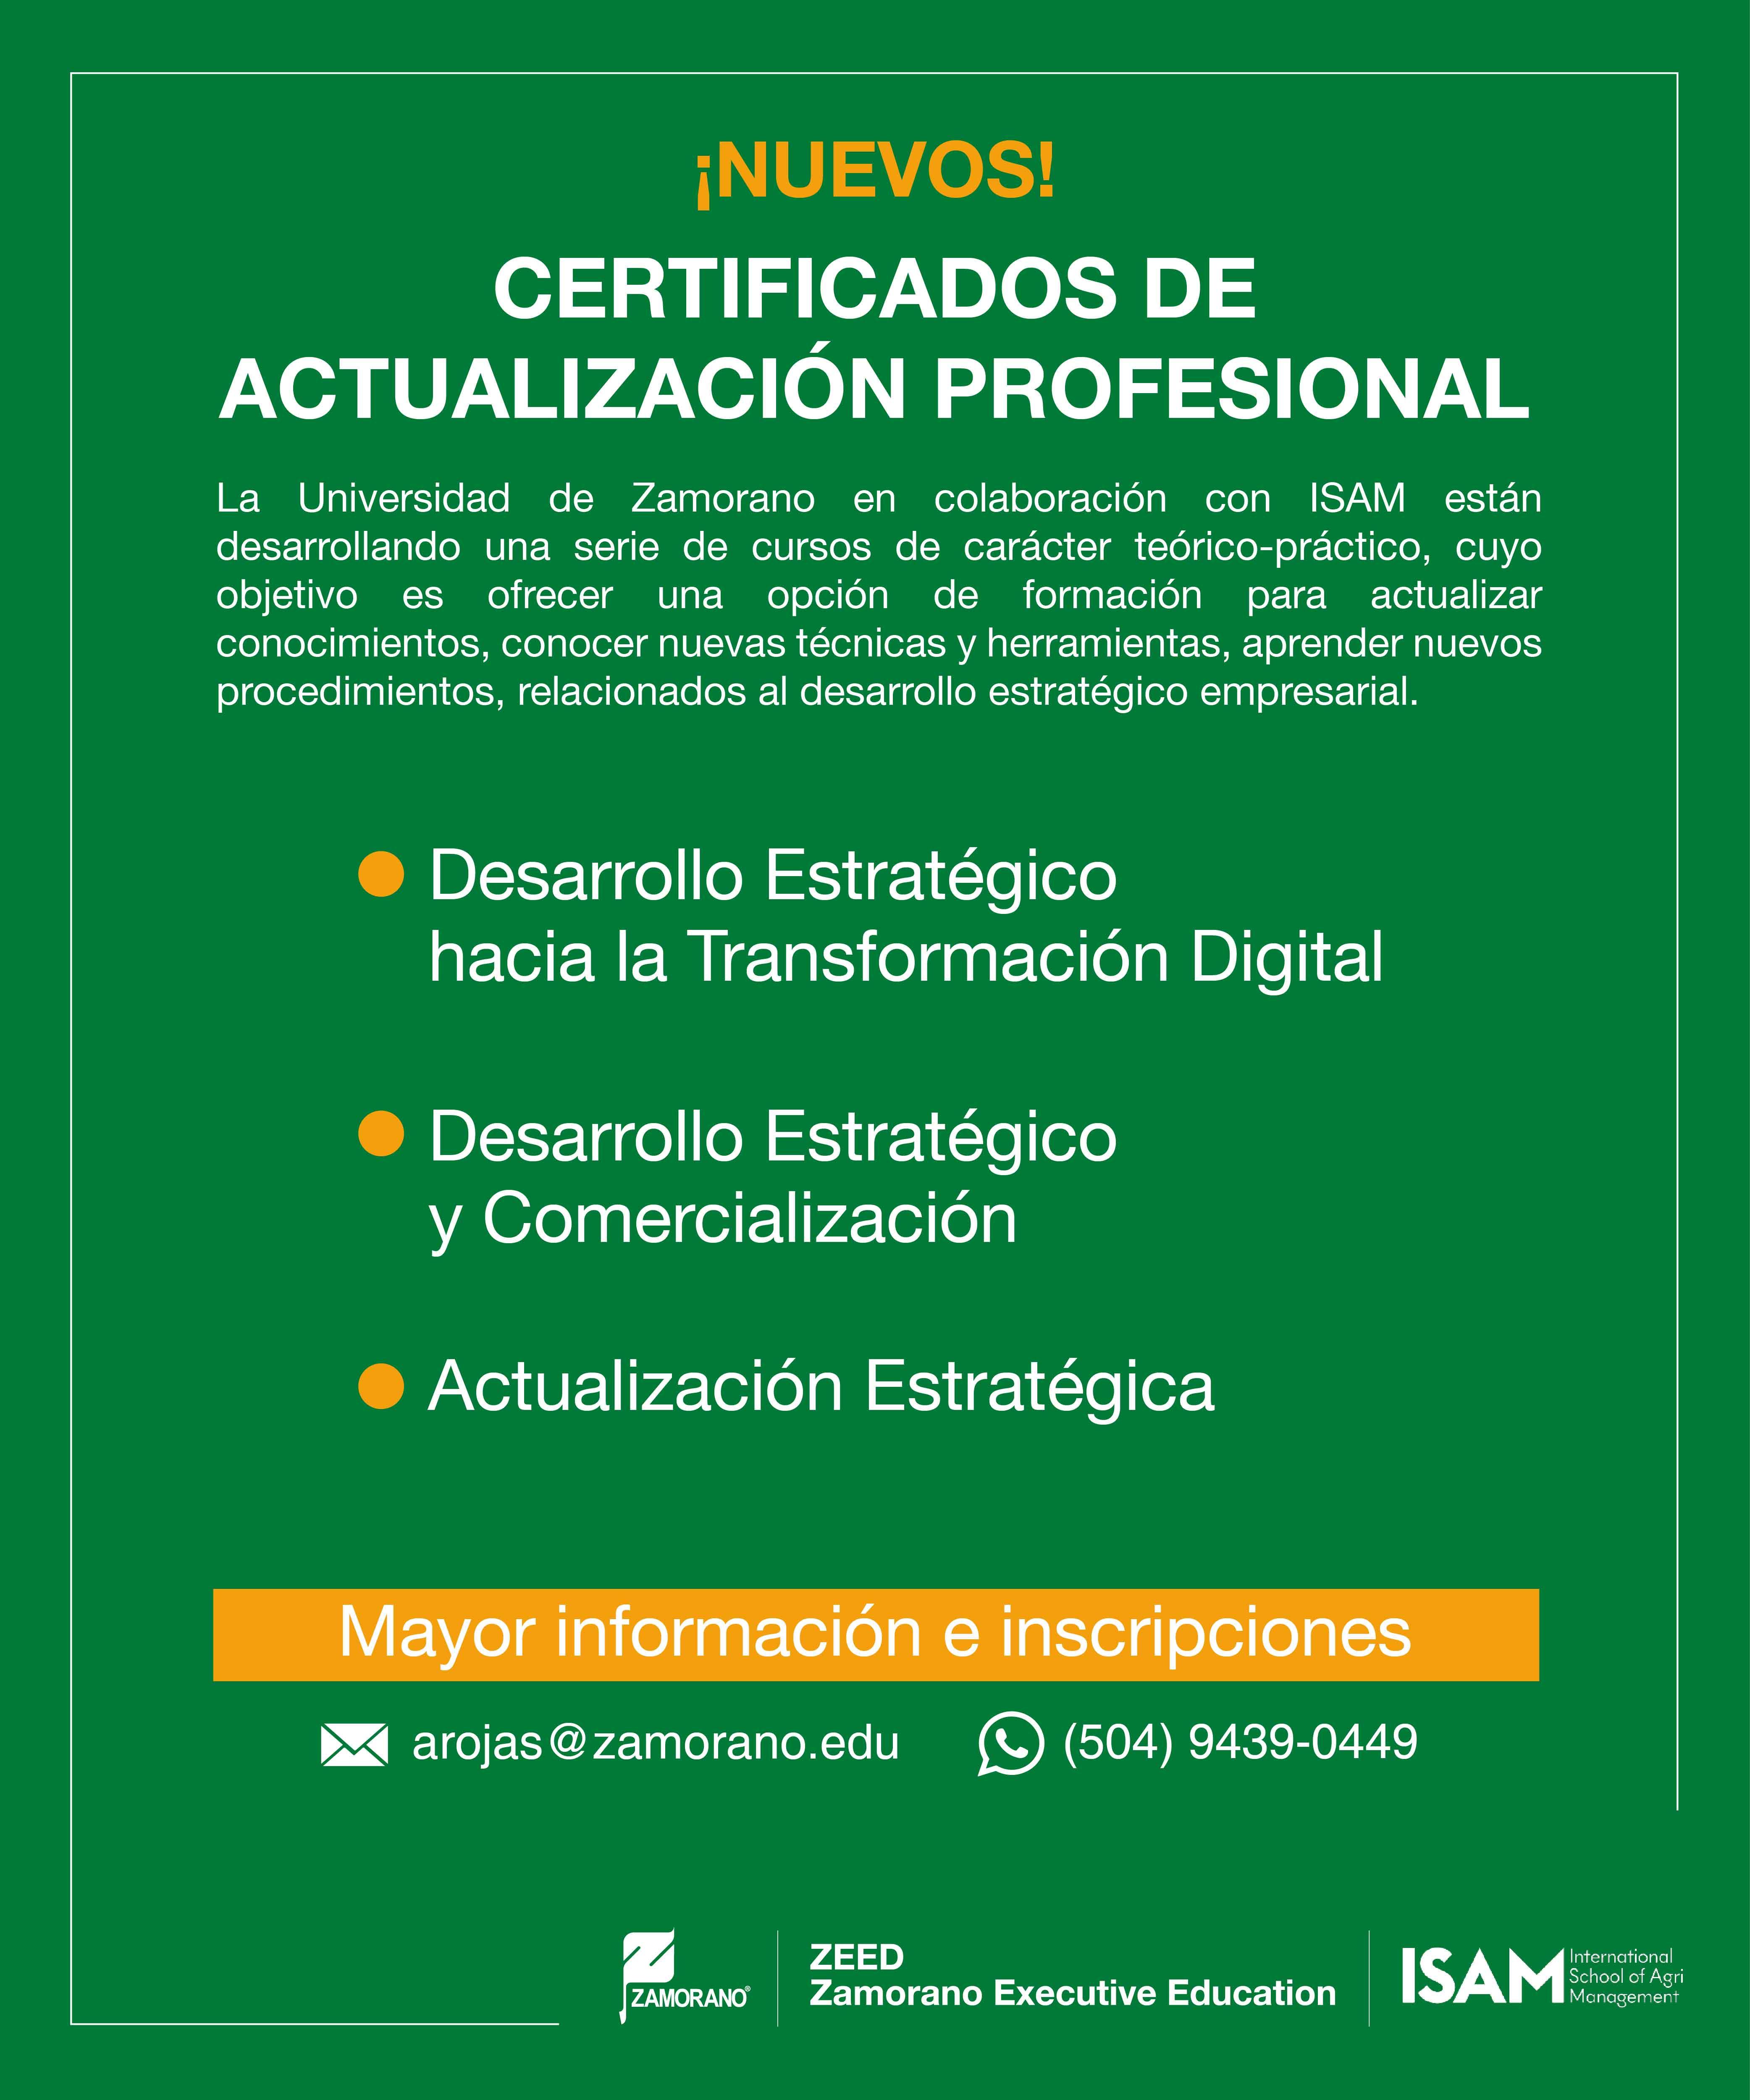 Certificado de Actualización Profesional - Zamorano ISAM-01